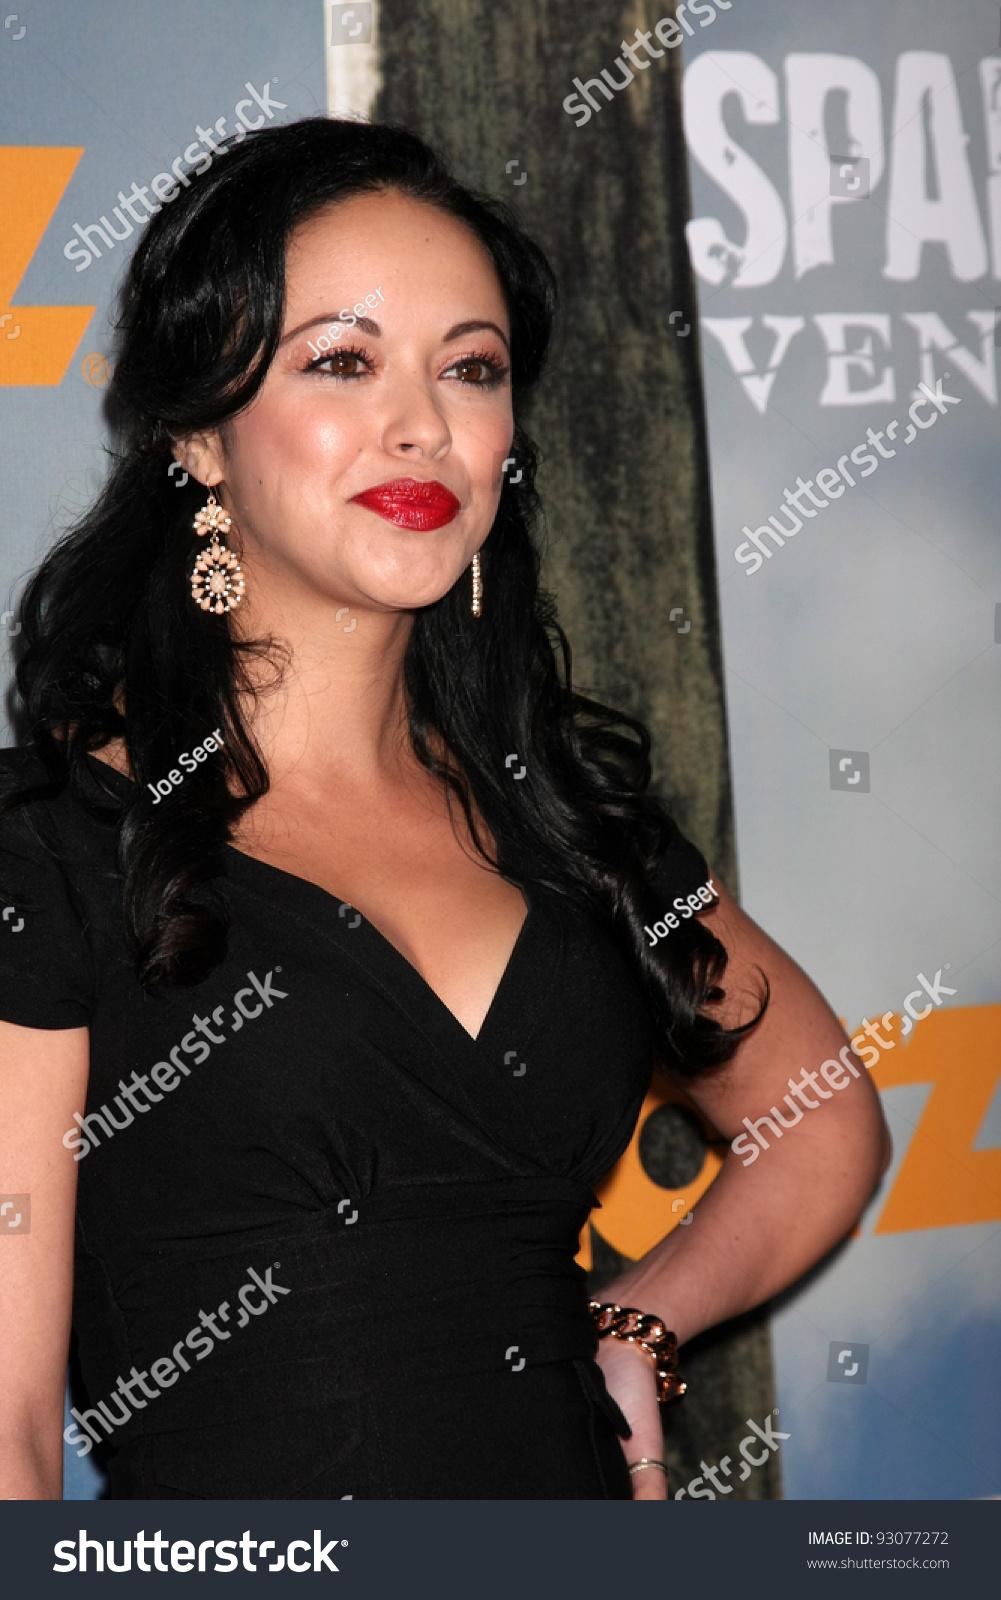 Debbie Matenopoulos picture